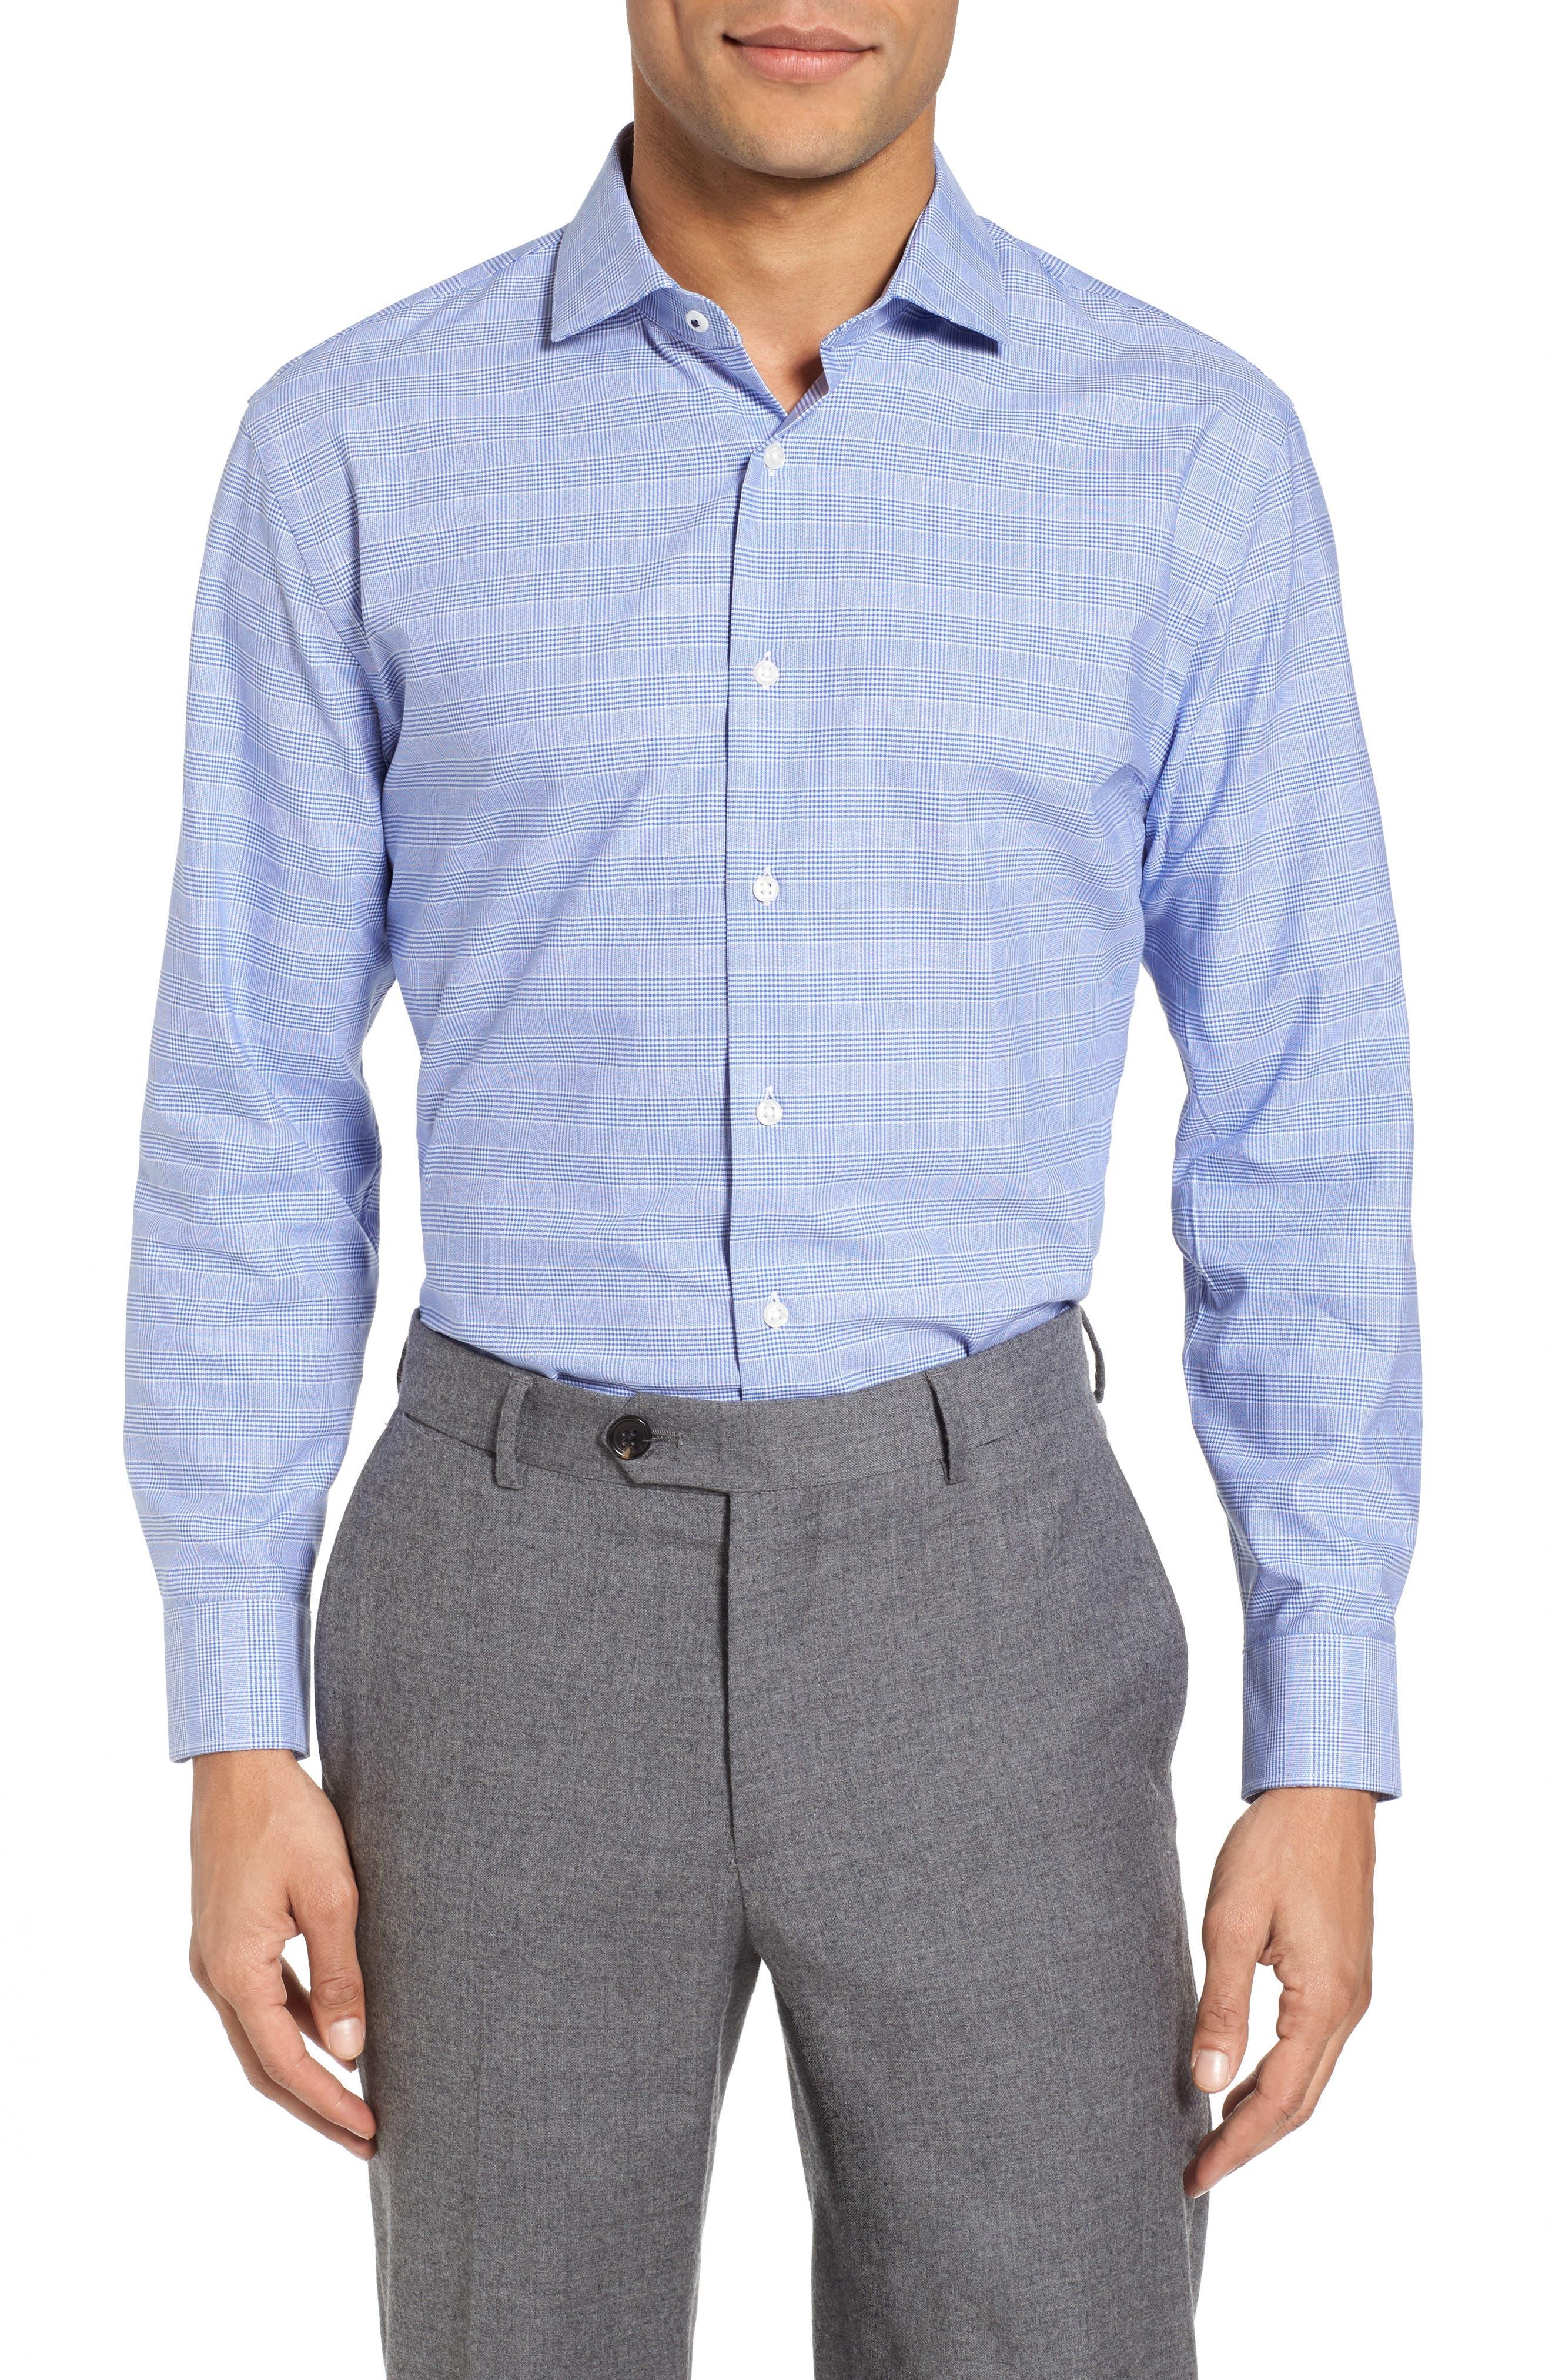 Alternate Image 1 Selected - Nordstrom Men's Shop Tech-Smart Trim Fit Stretch Plaid Dress Shirt